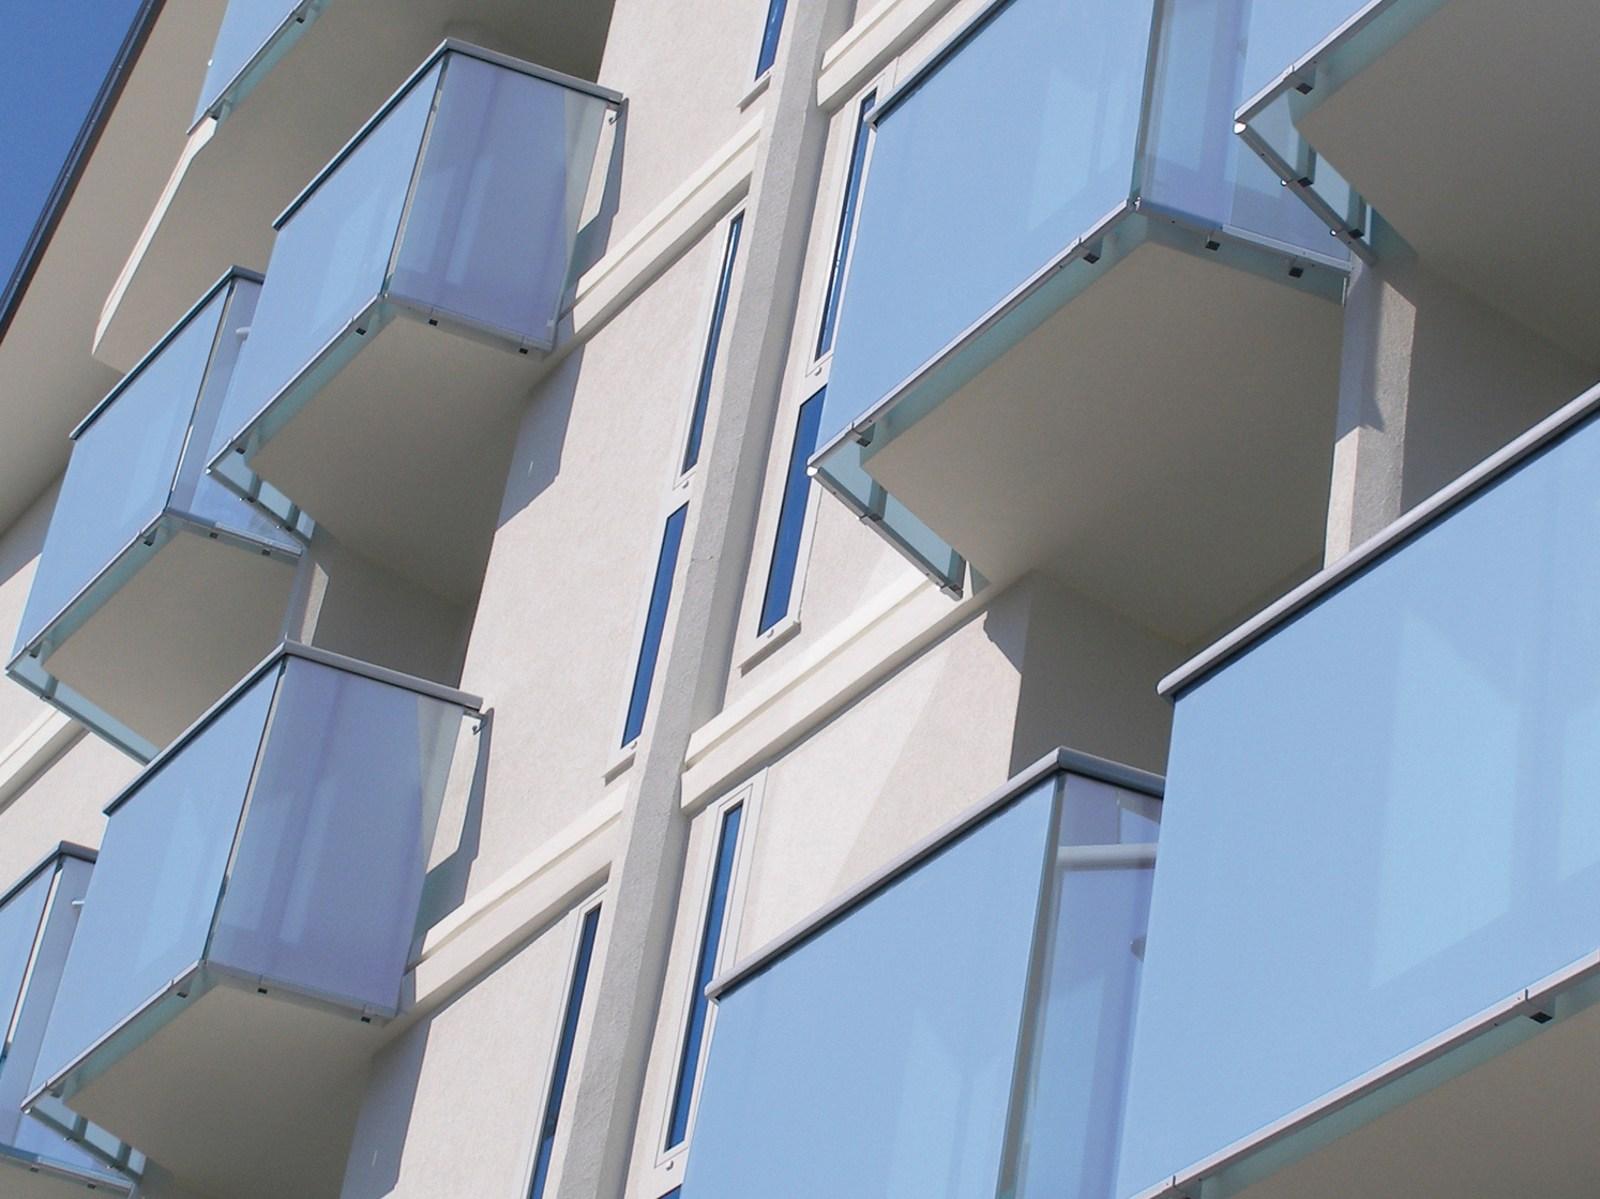 Sistema antifurto per balconi